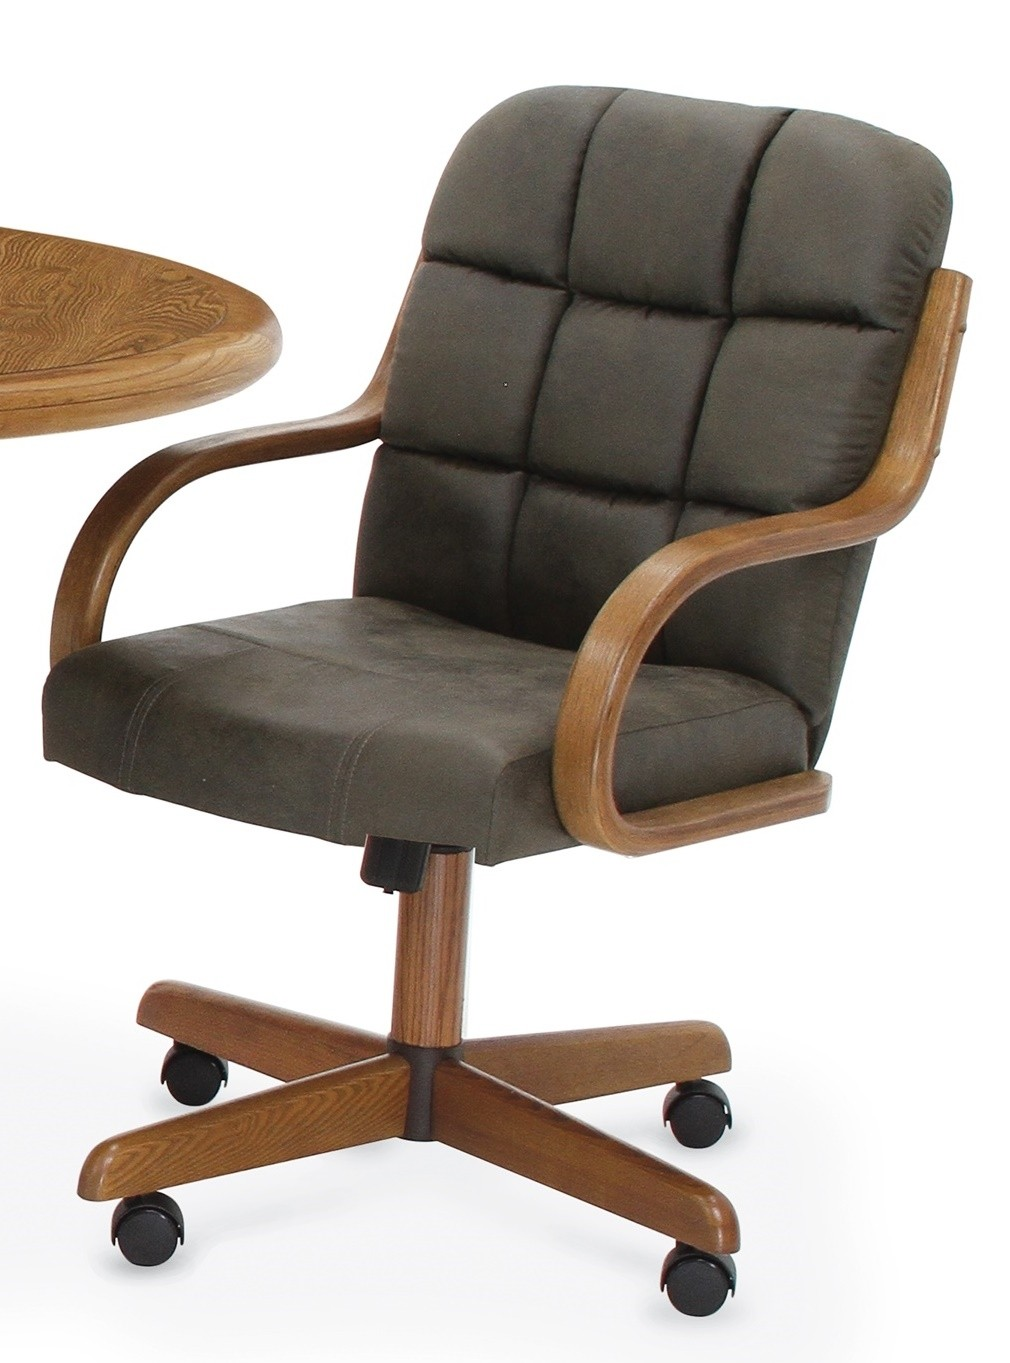 Douglas Furniture Meghan Swivel Rocker Roller Chair